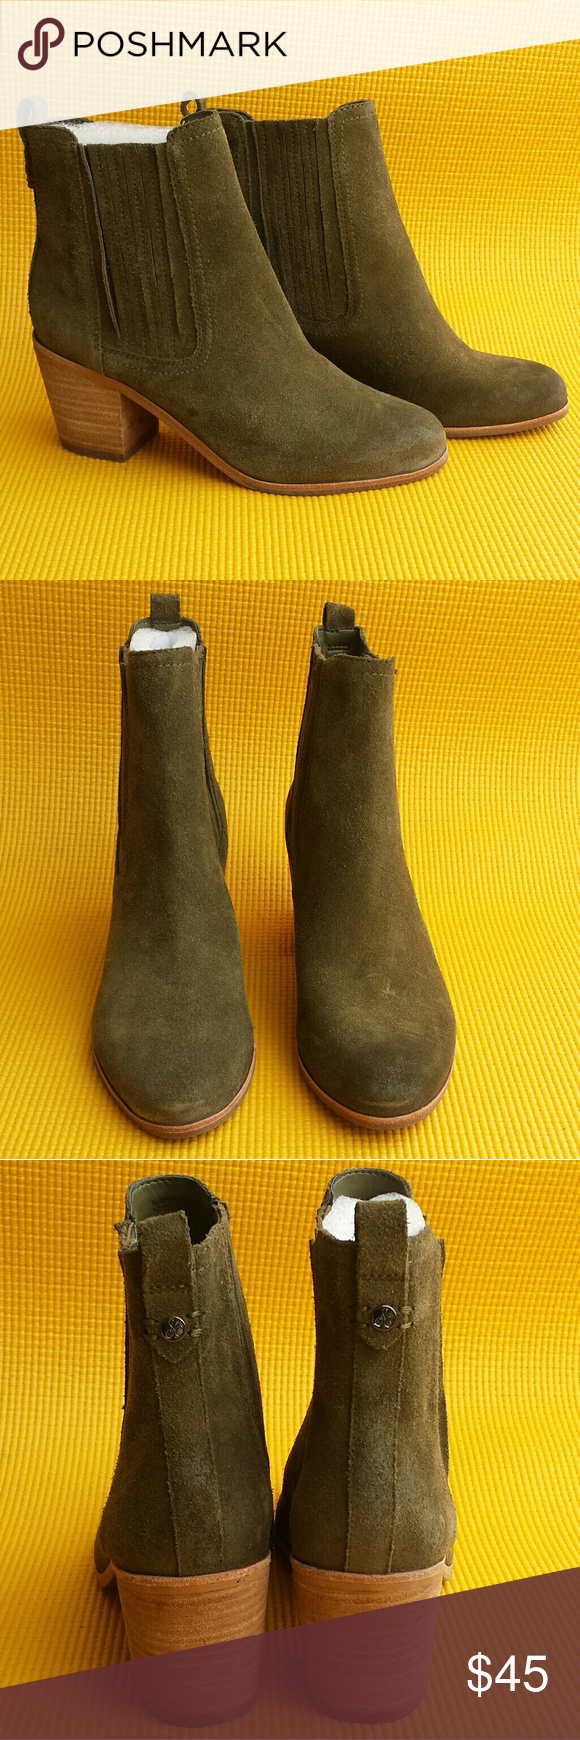 7c390eb85 Selling this Sam Edelman Lance on Poshmark! My username is  nkrumah7.   shopmycloset  poshmark  fashion  shopping  style  forsale  Sam Edelman   Shoes